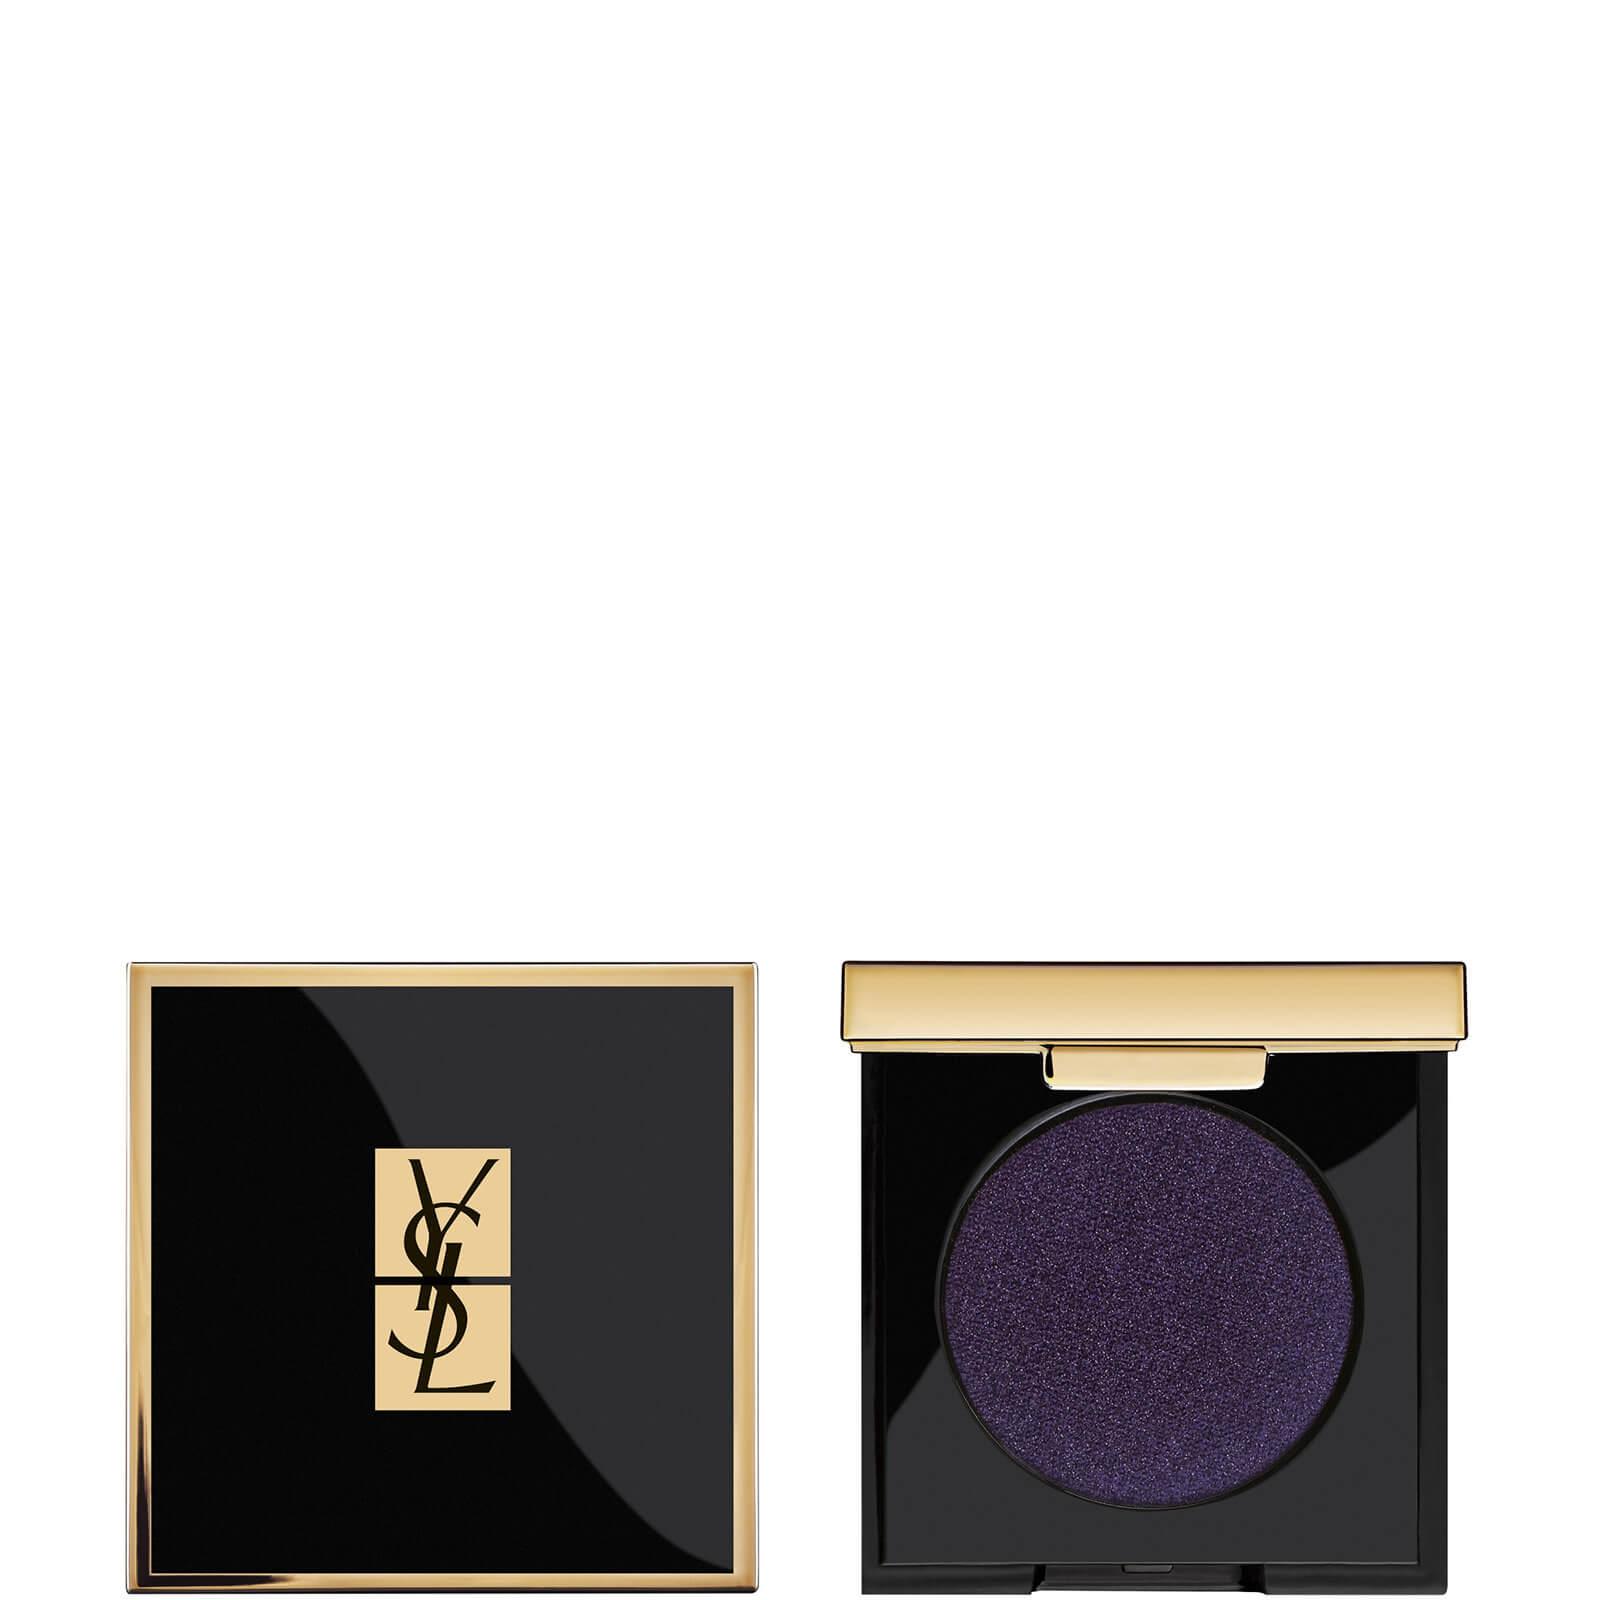 Купить Yves Saint Laurent Couture Crush Matte Mono Eyeshadow (Various Shades) - #42